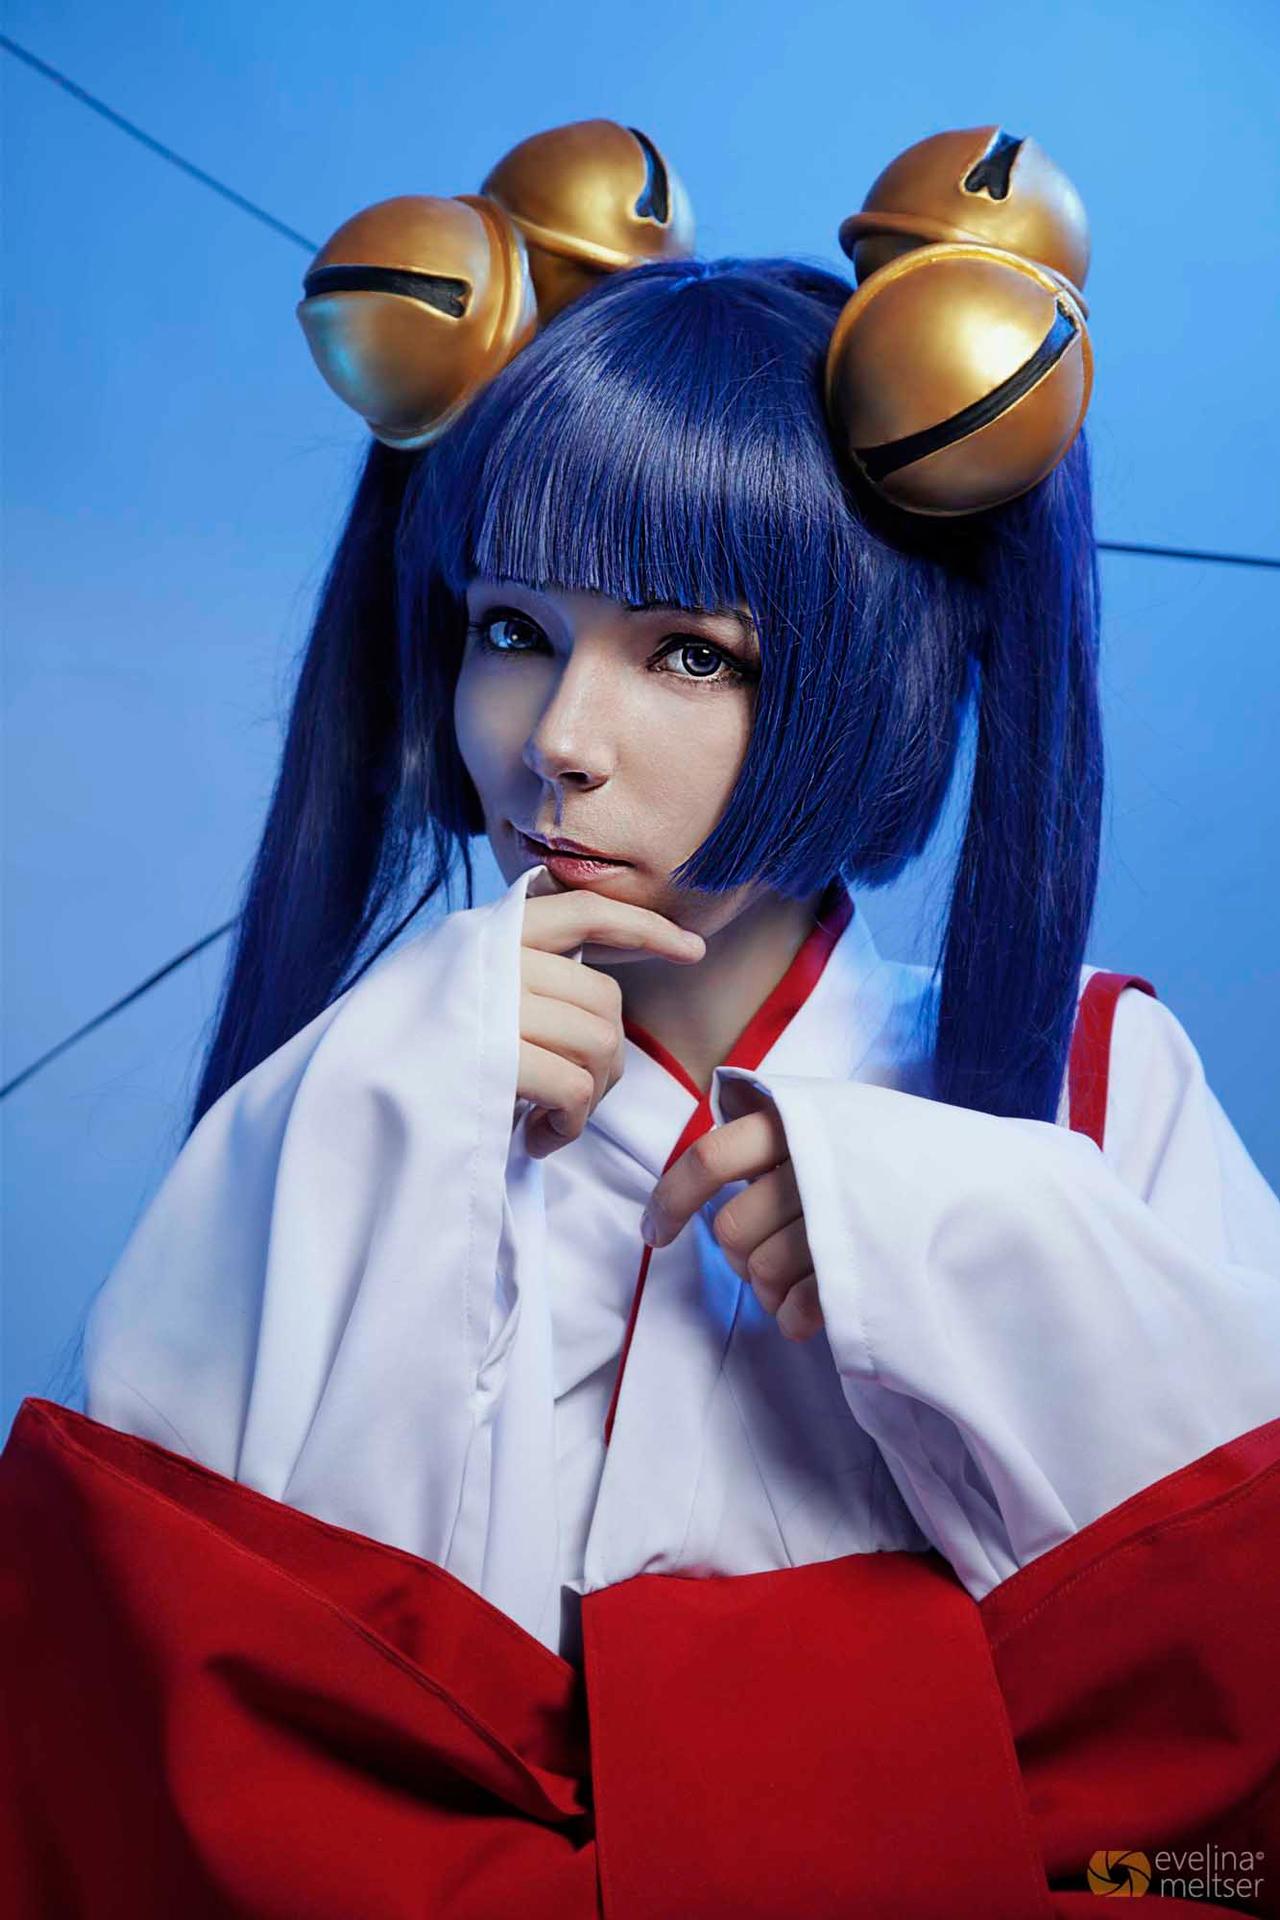 Kotoko (1) by Junica-Hots